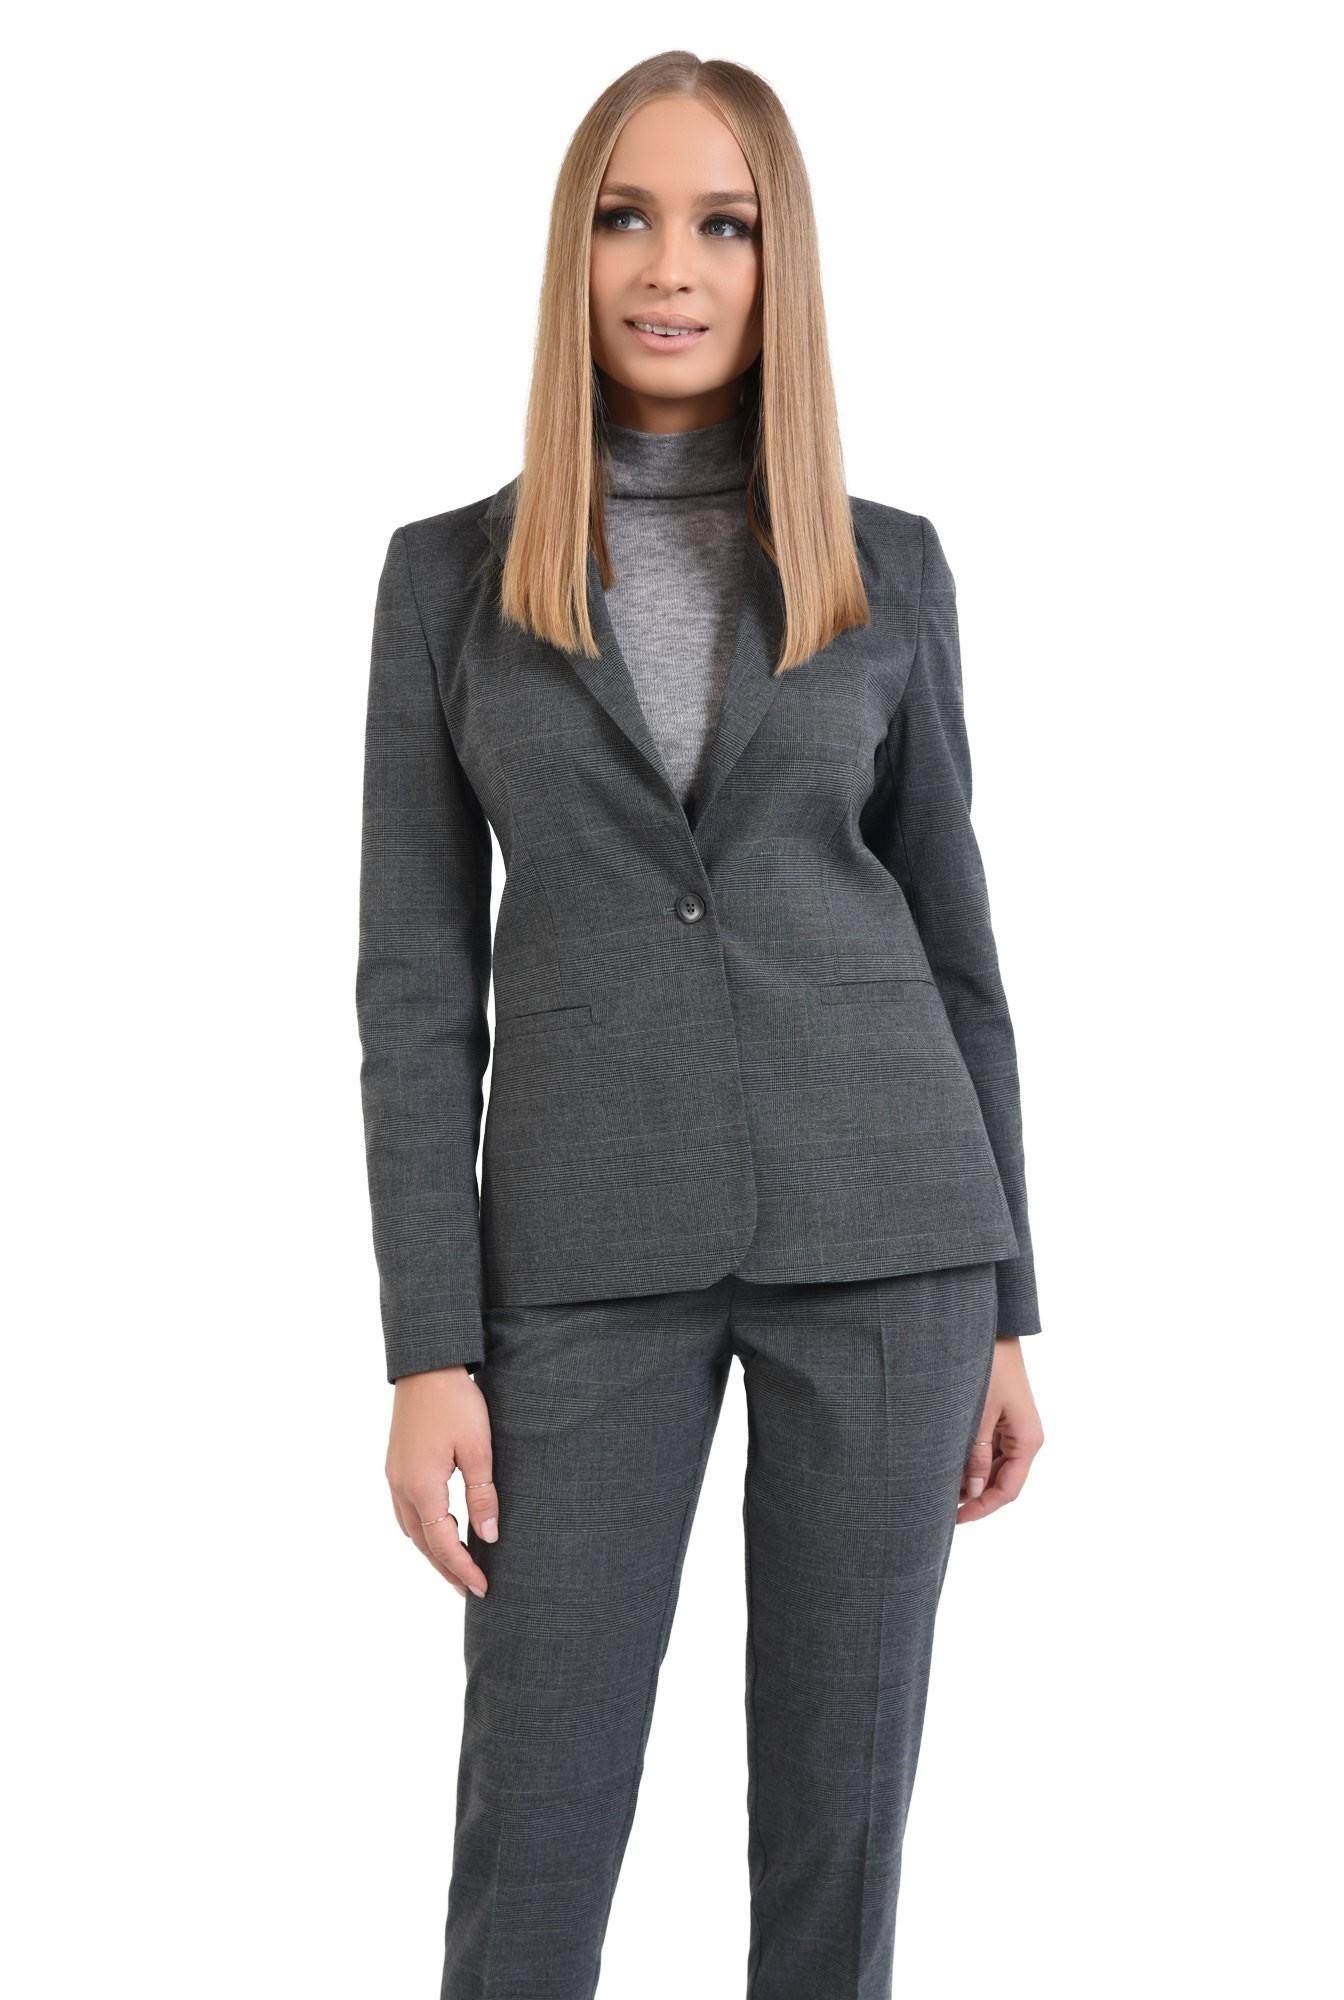 0 - pantaloni in carouri, de birou, offfice, pantaloni dama, pantaloni online